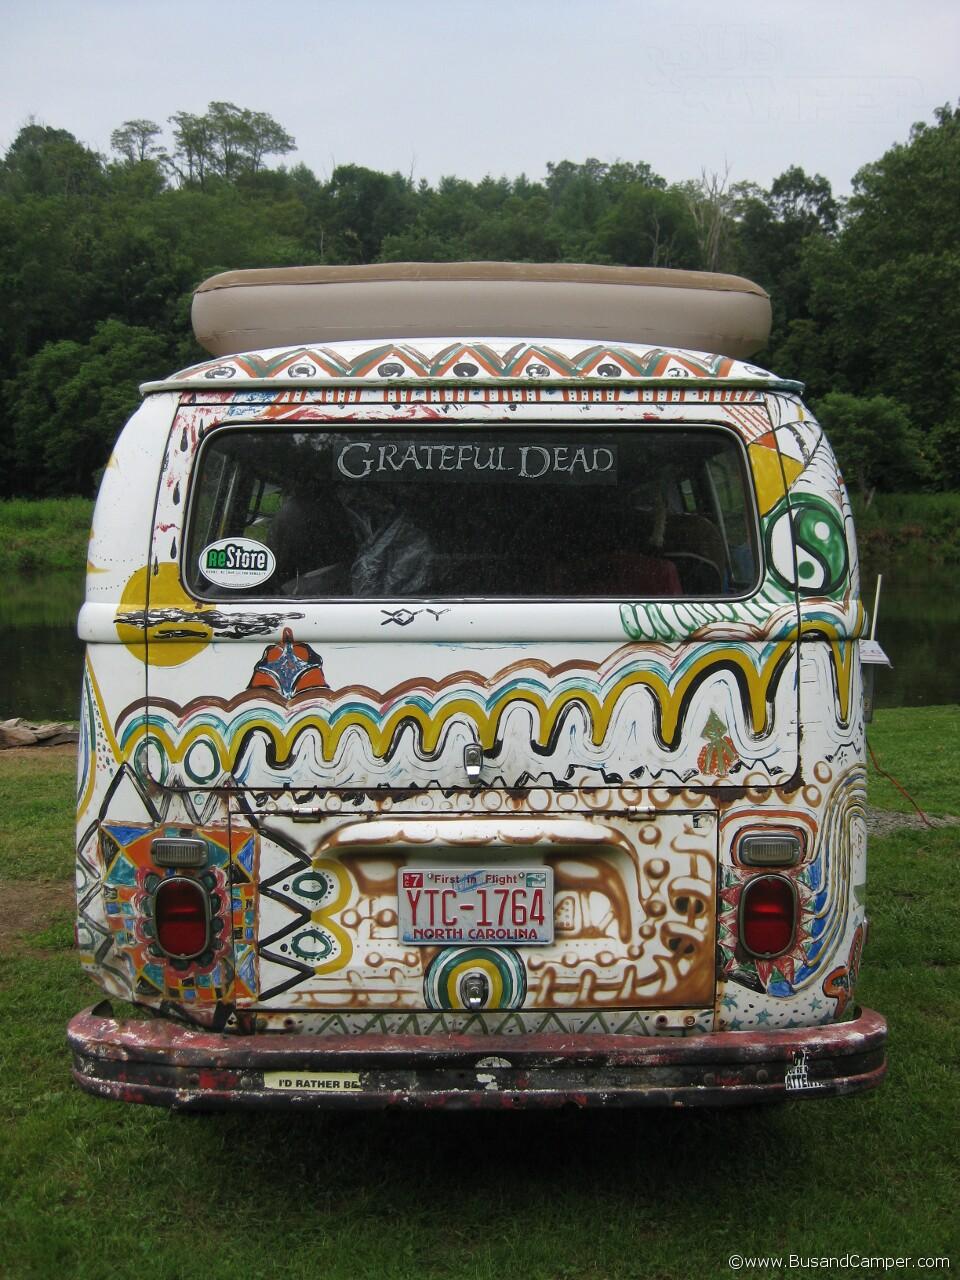 Grateful dead hand painted bus 1